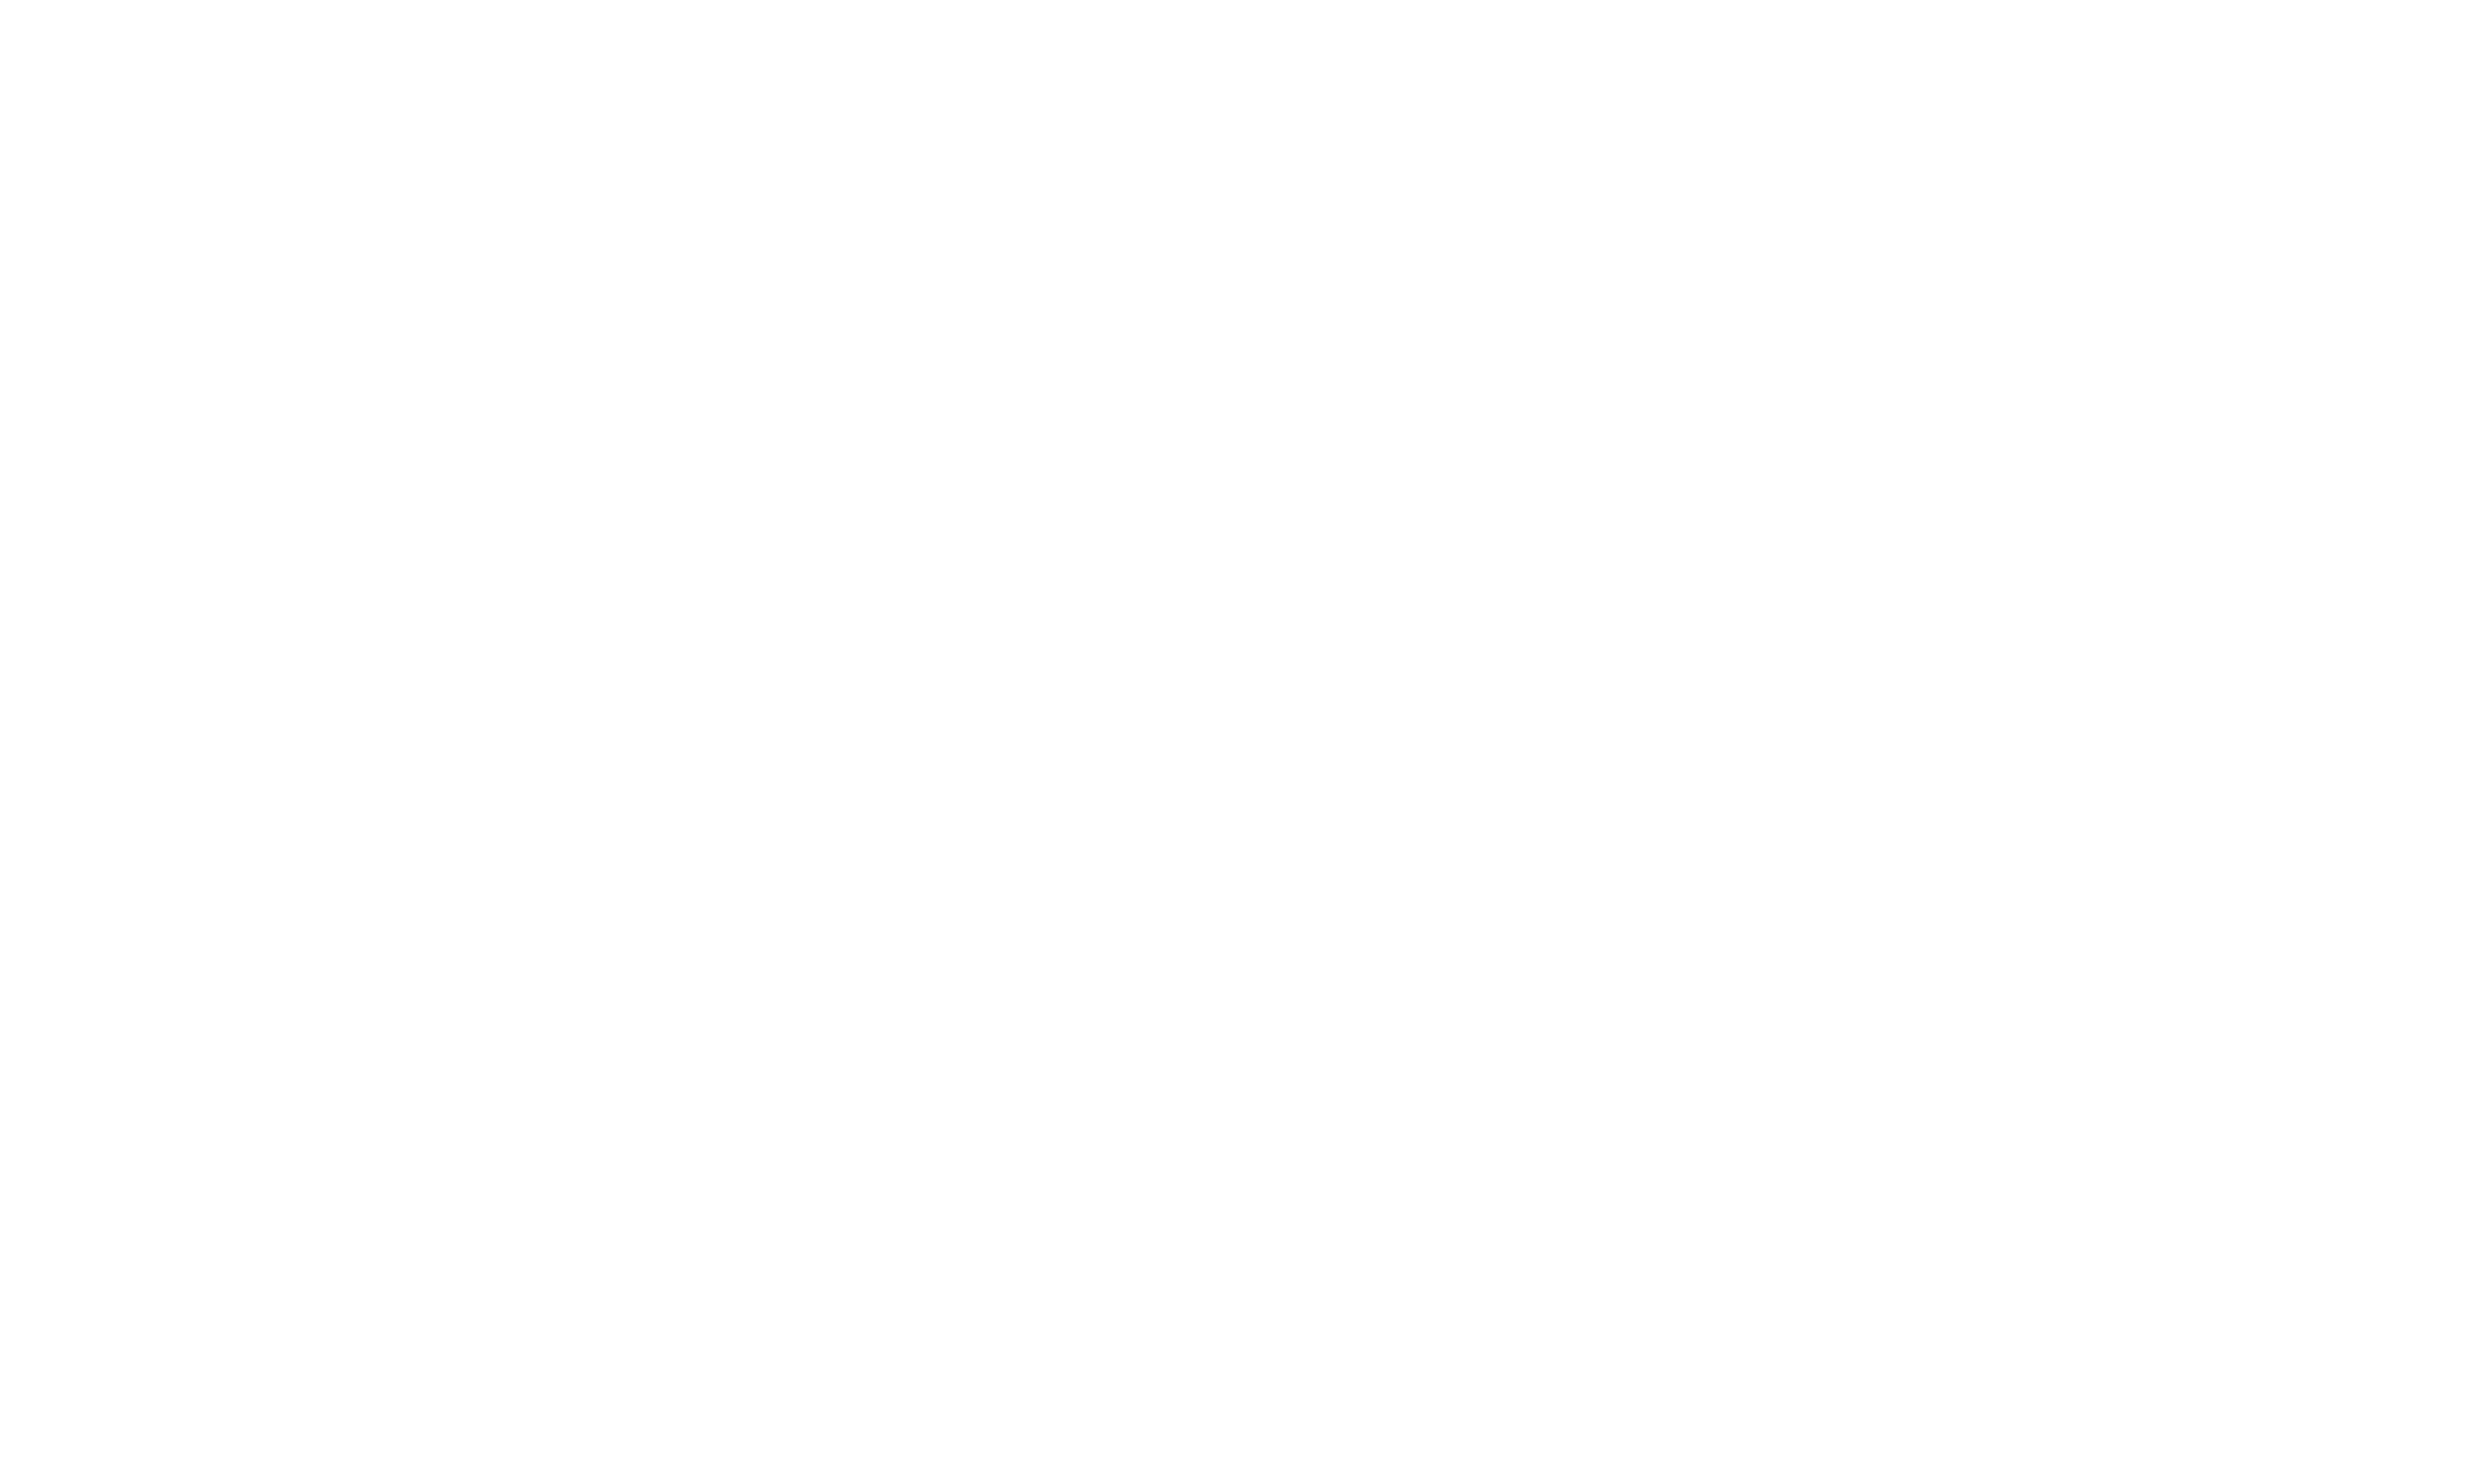 orbiter_5